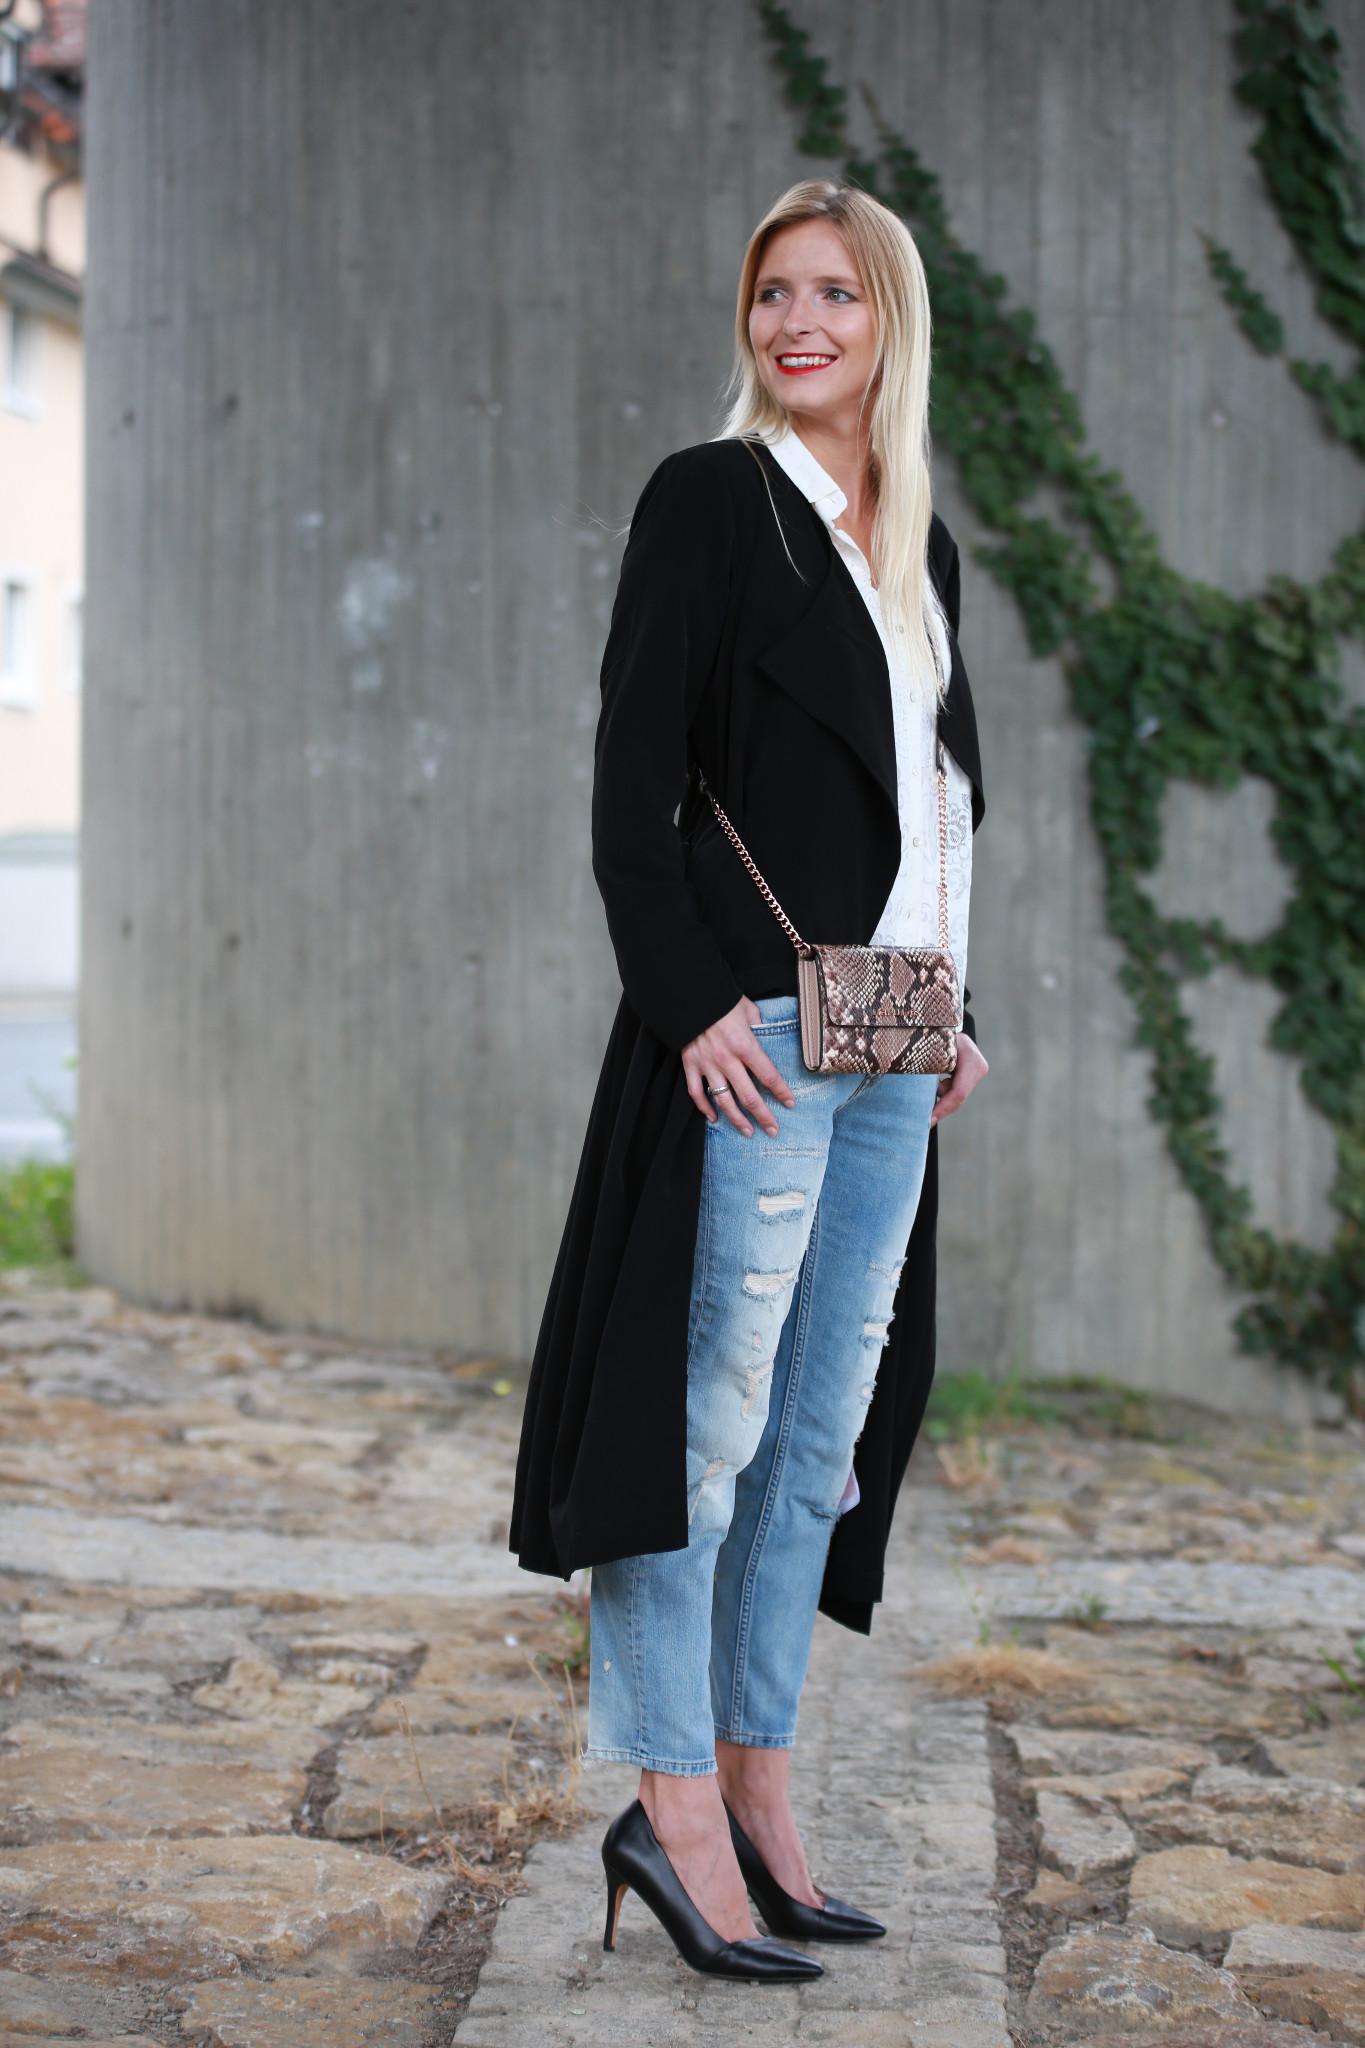 Fashion_Outfit_Michael_Kors_Jet_Set_8